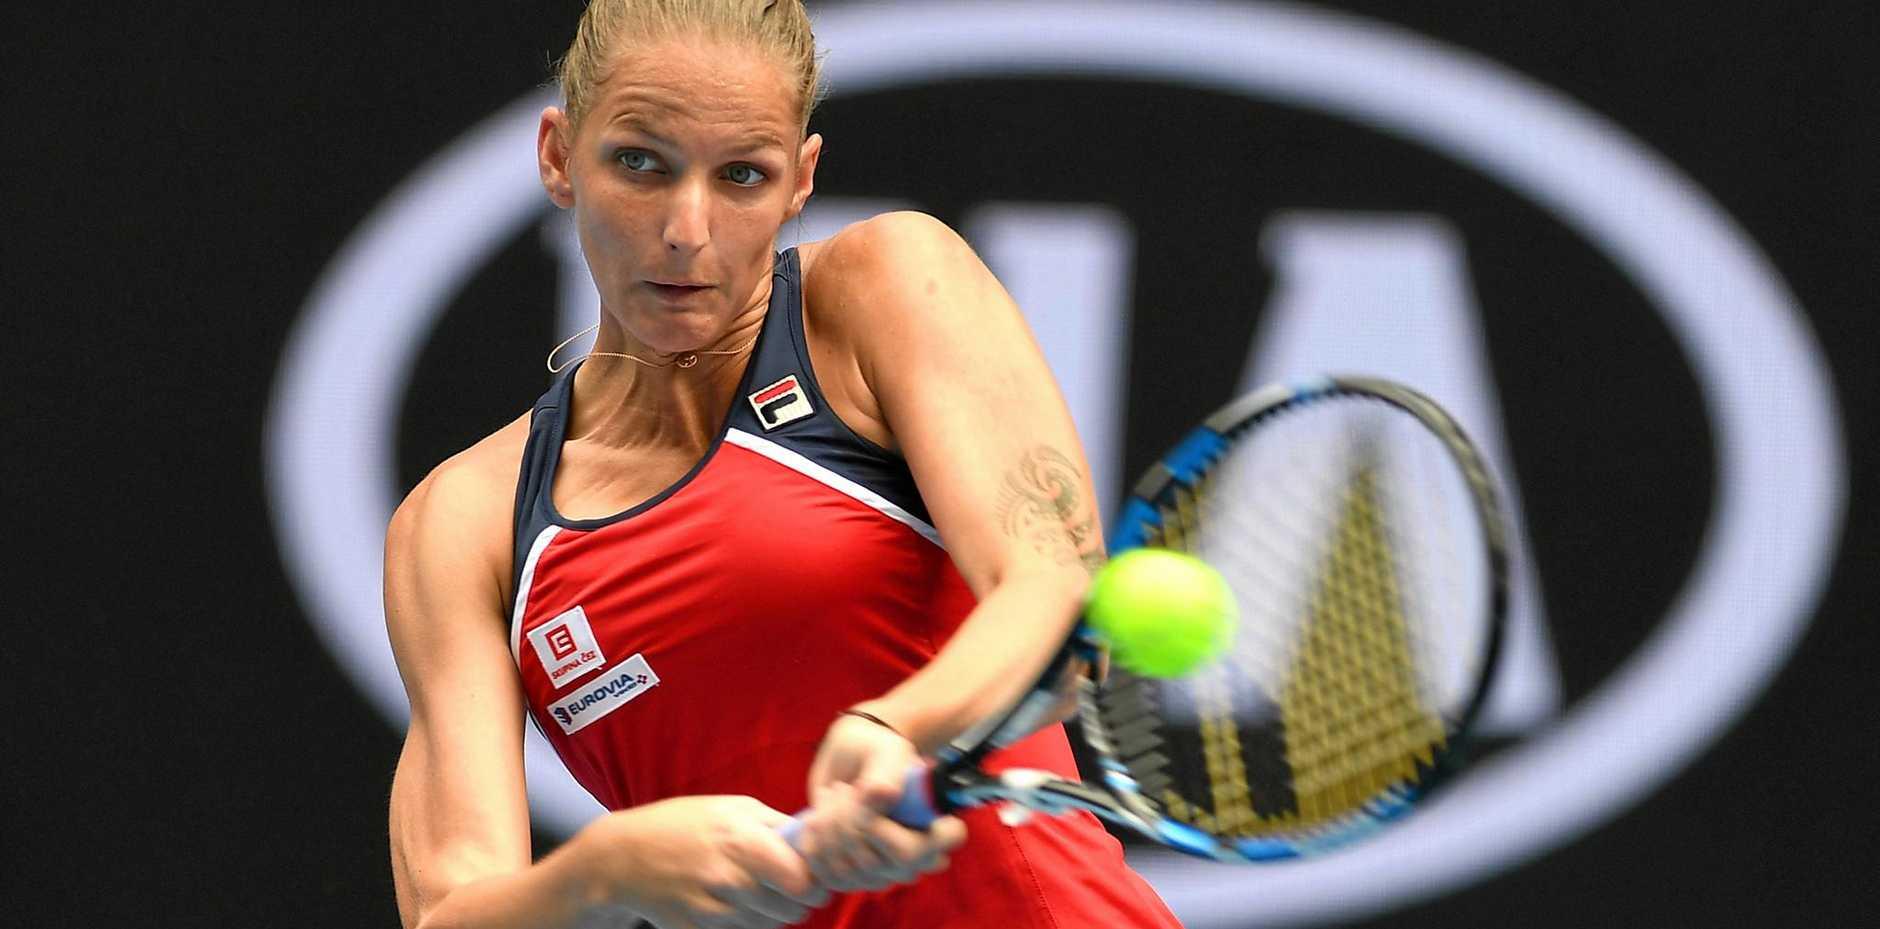 Karolina Pliskova of the Czech Republic in action against Sara Sorribes Tormo of Spain.